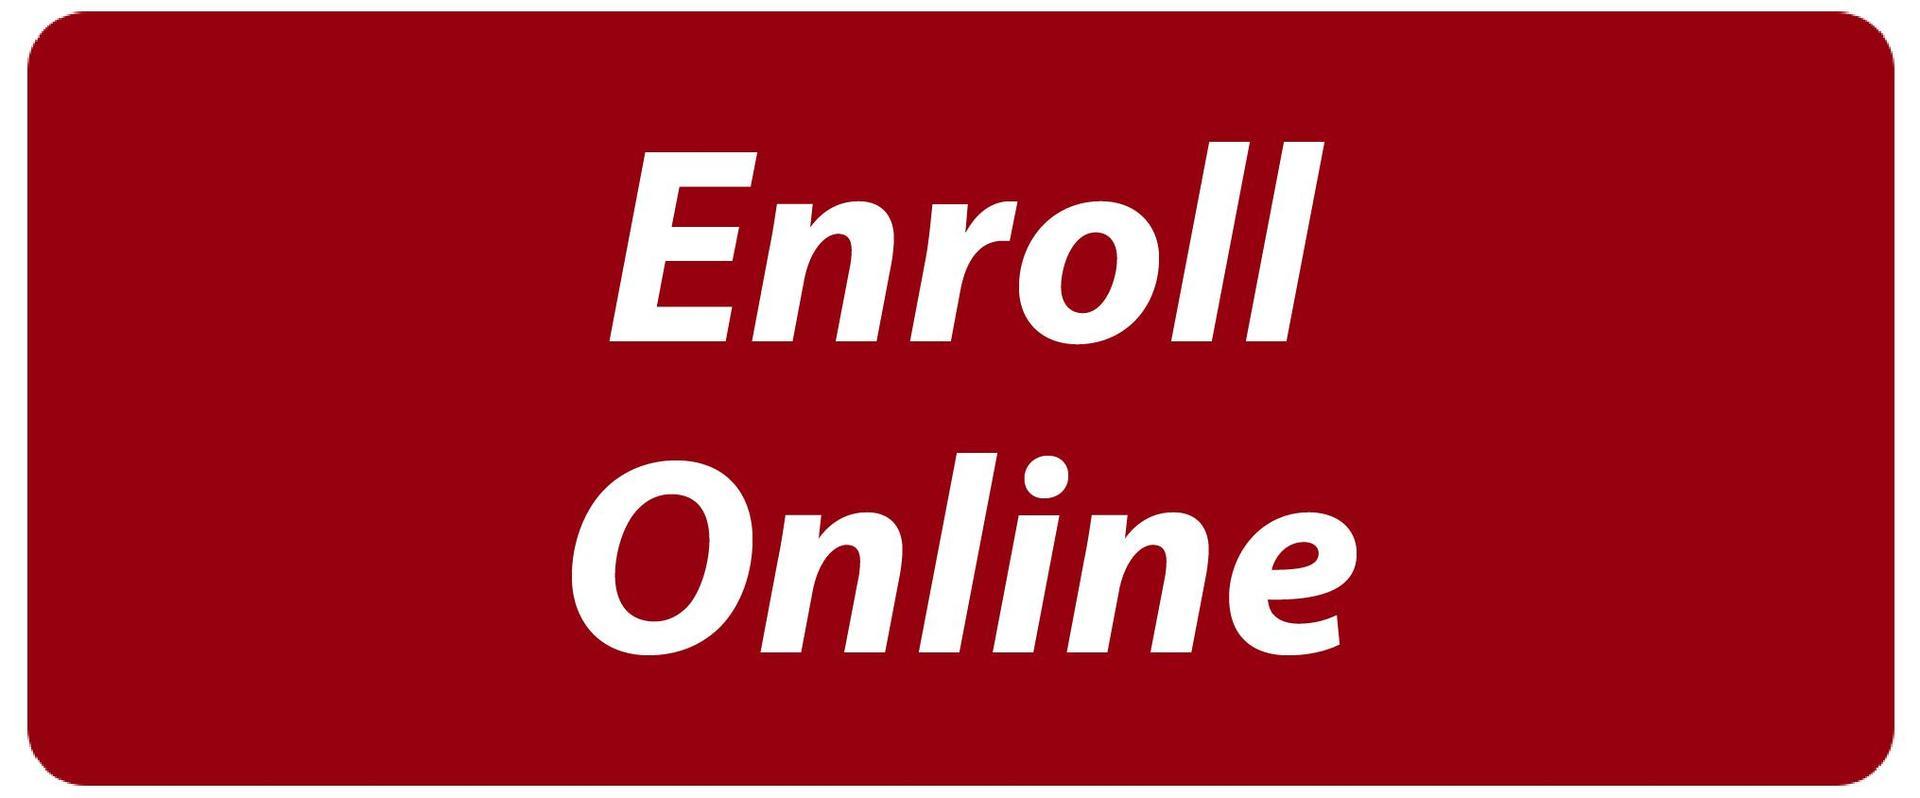 Enroll Online